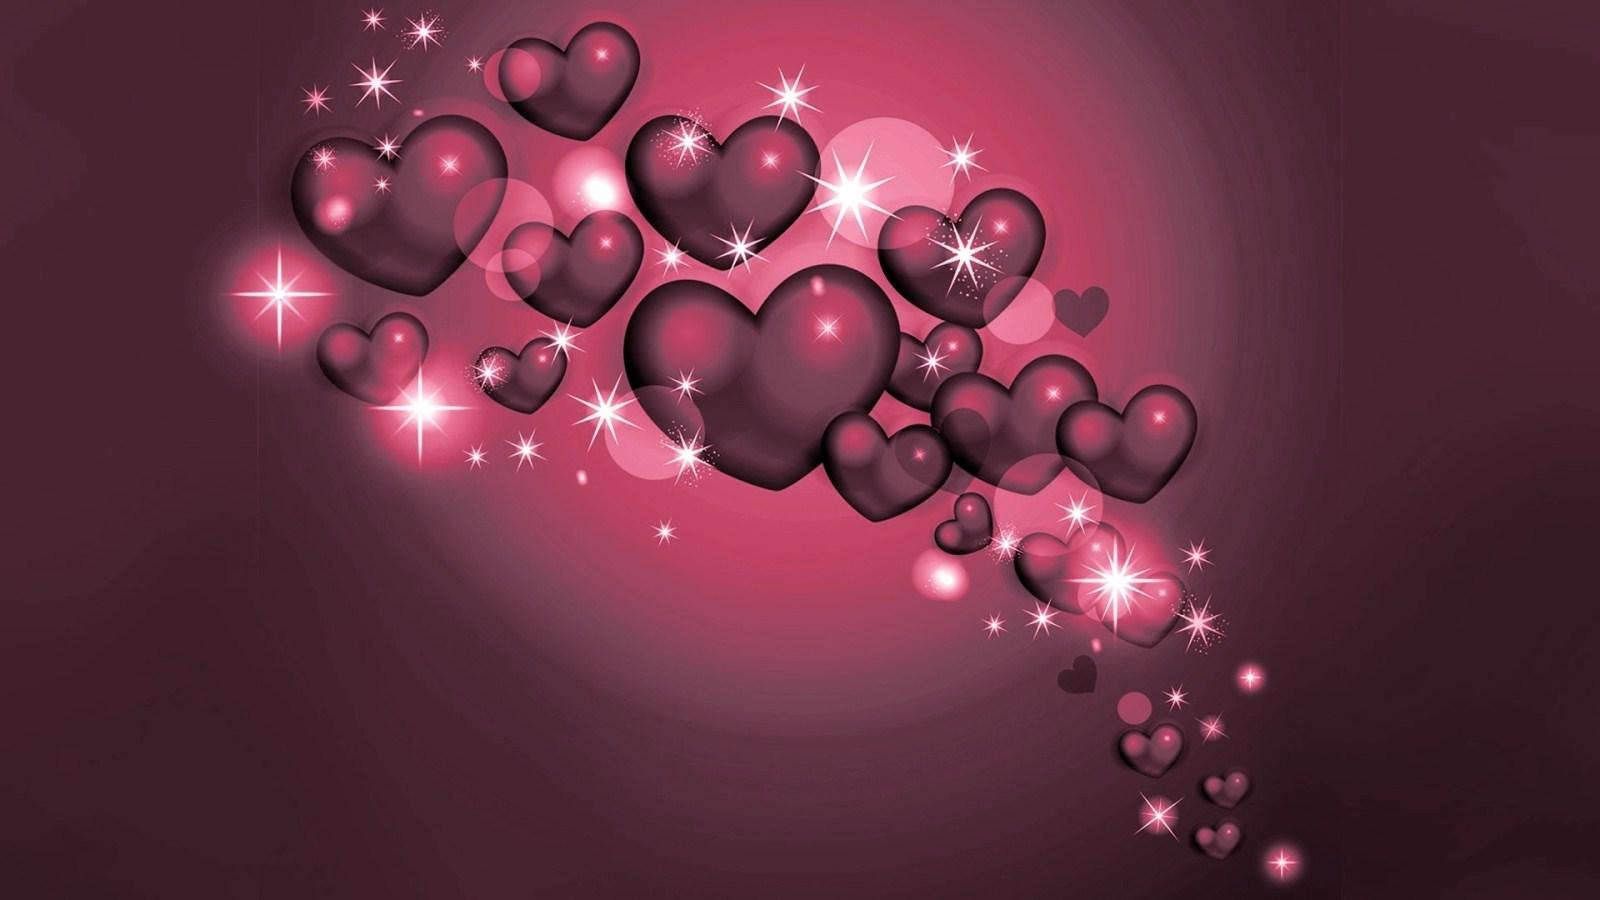 love heart 3d hd wallpapers 1080p download 1600x900